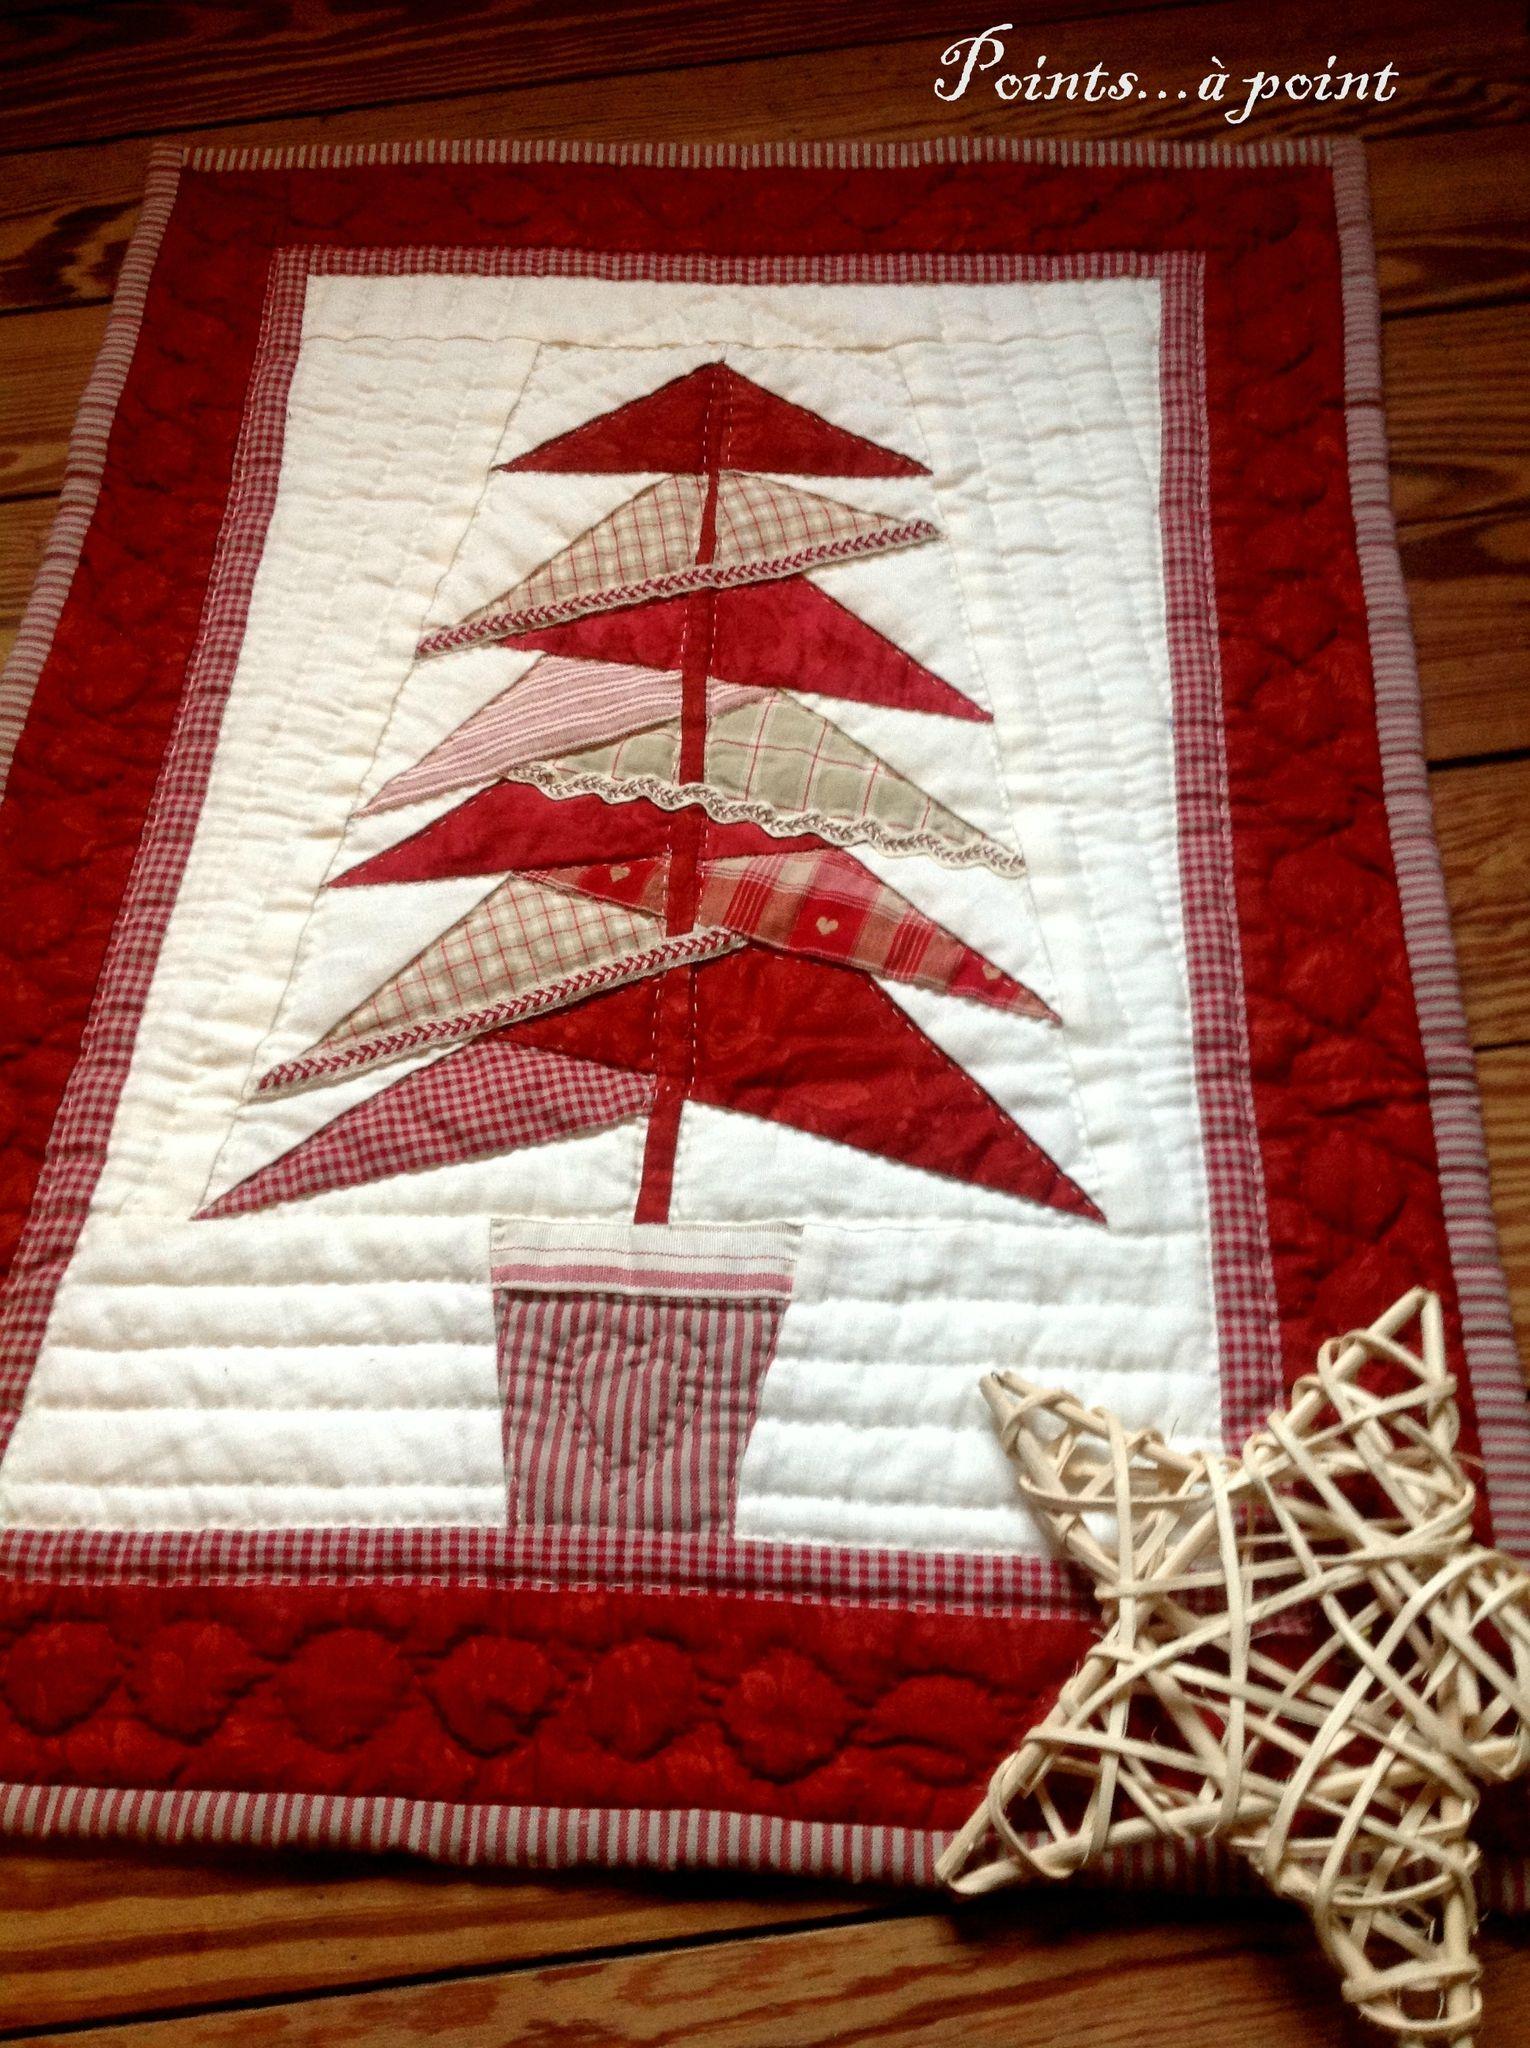 voeux pour no l points point deco noel christmas tree quilt christmas sewing et. Black Bedroom Furniture Sets. Home Design Ideas